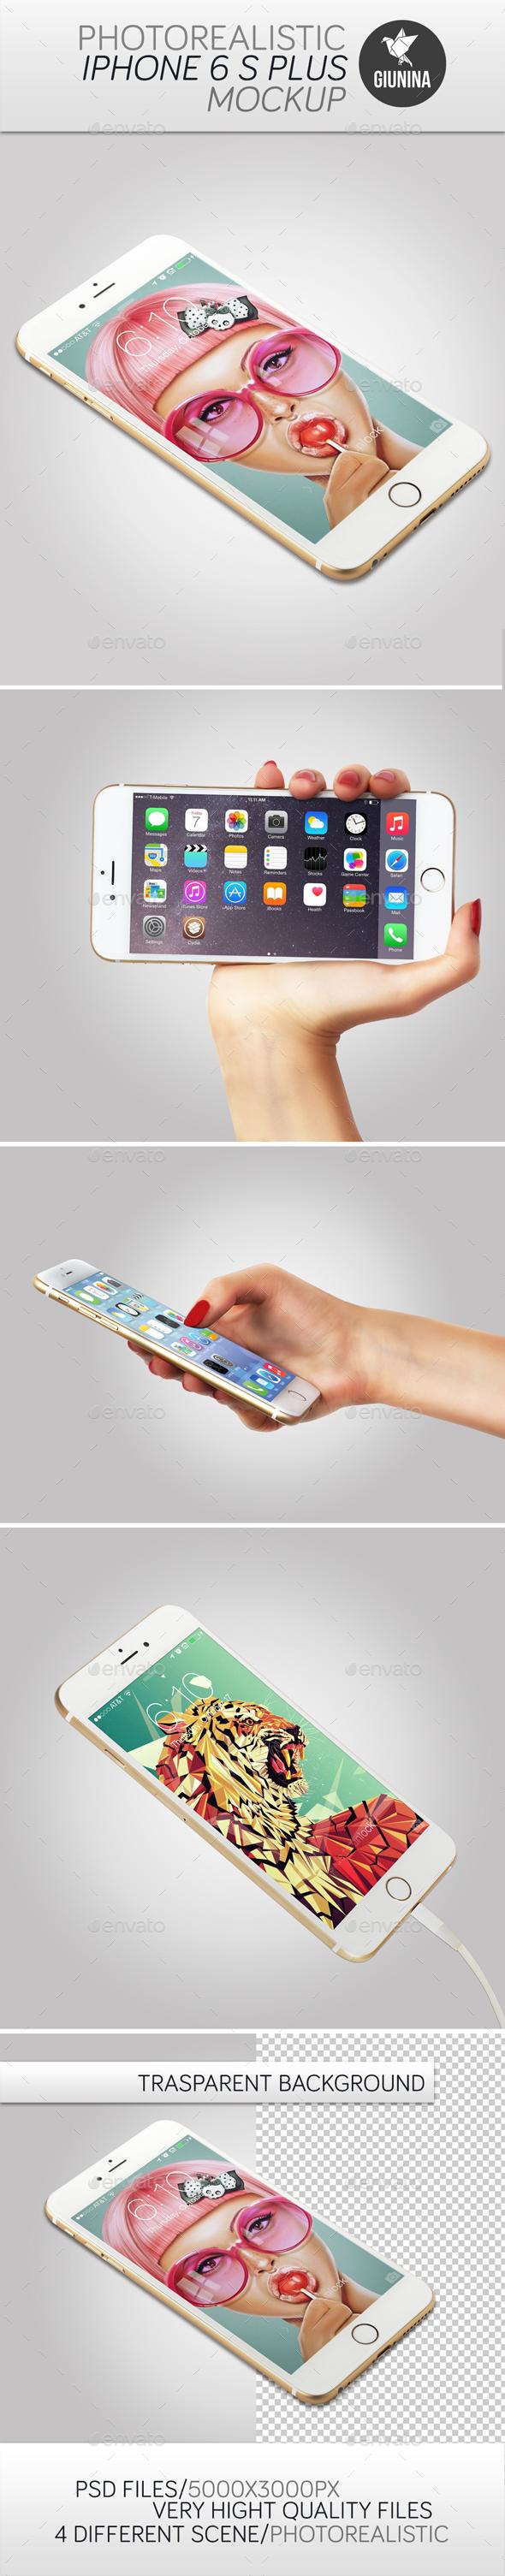 iPhone 6 S Plus Photorealistic Mockup - Graphics